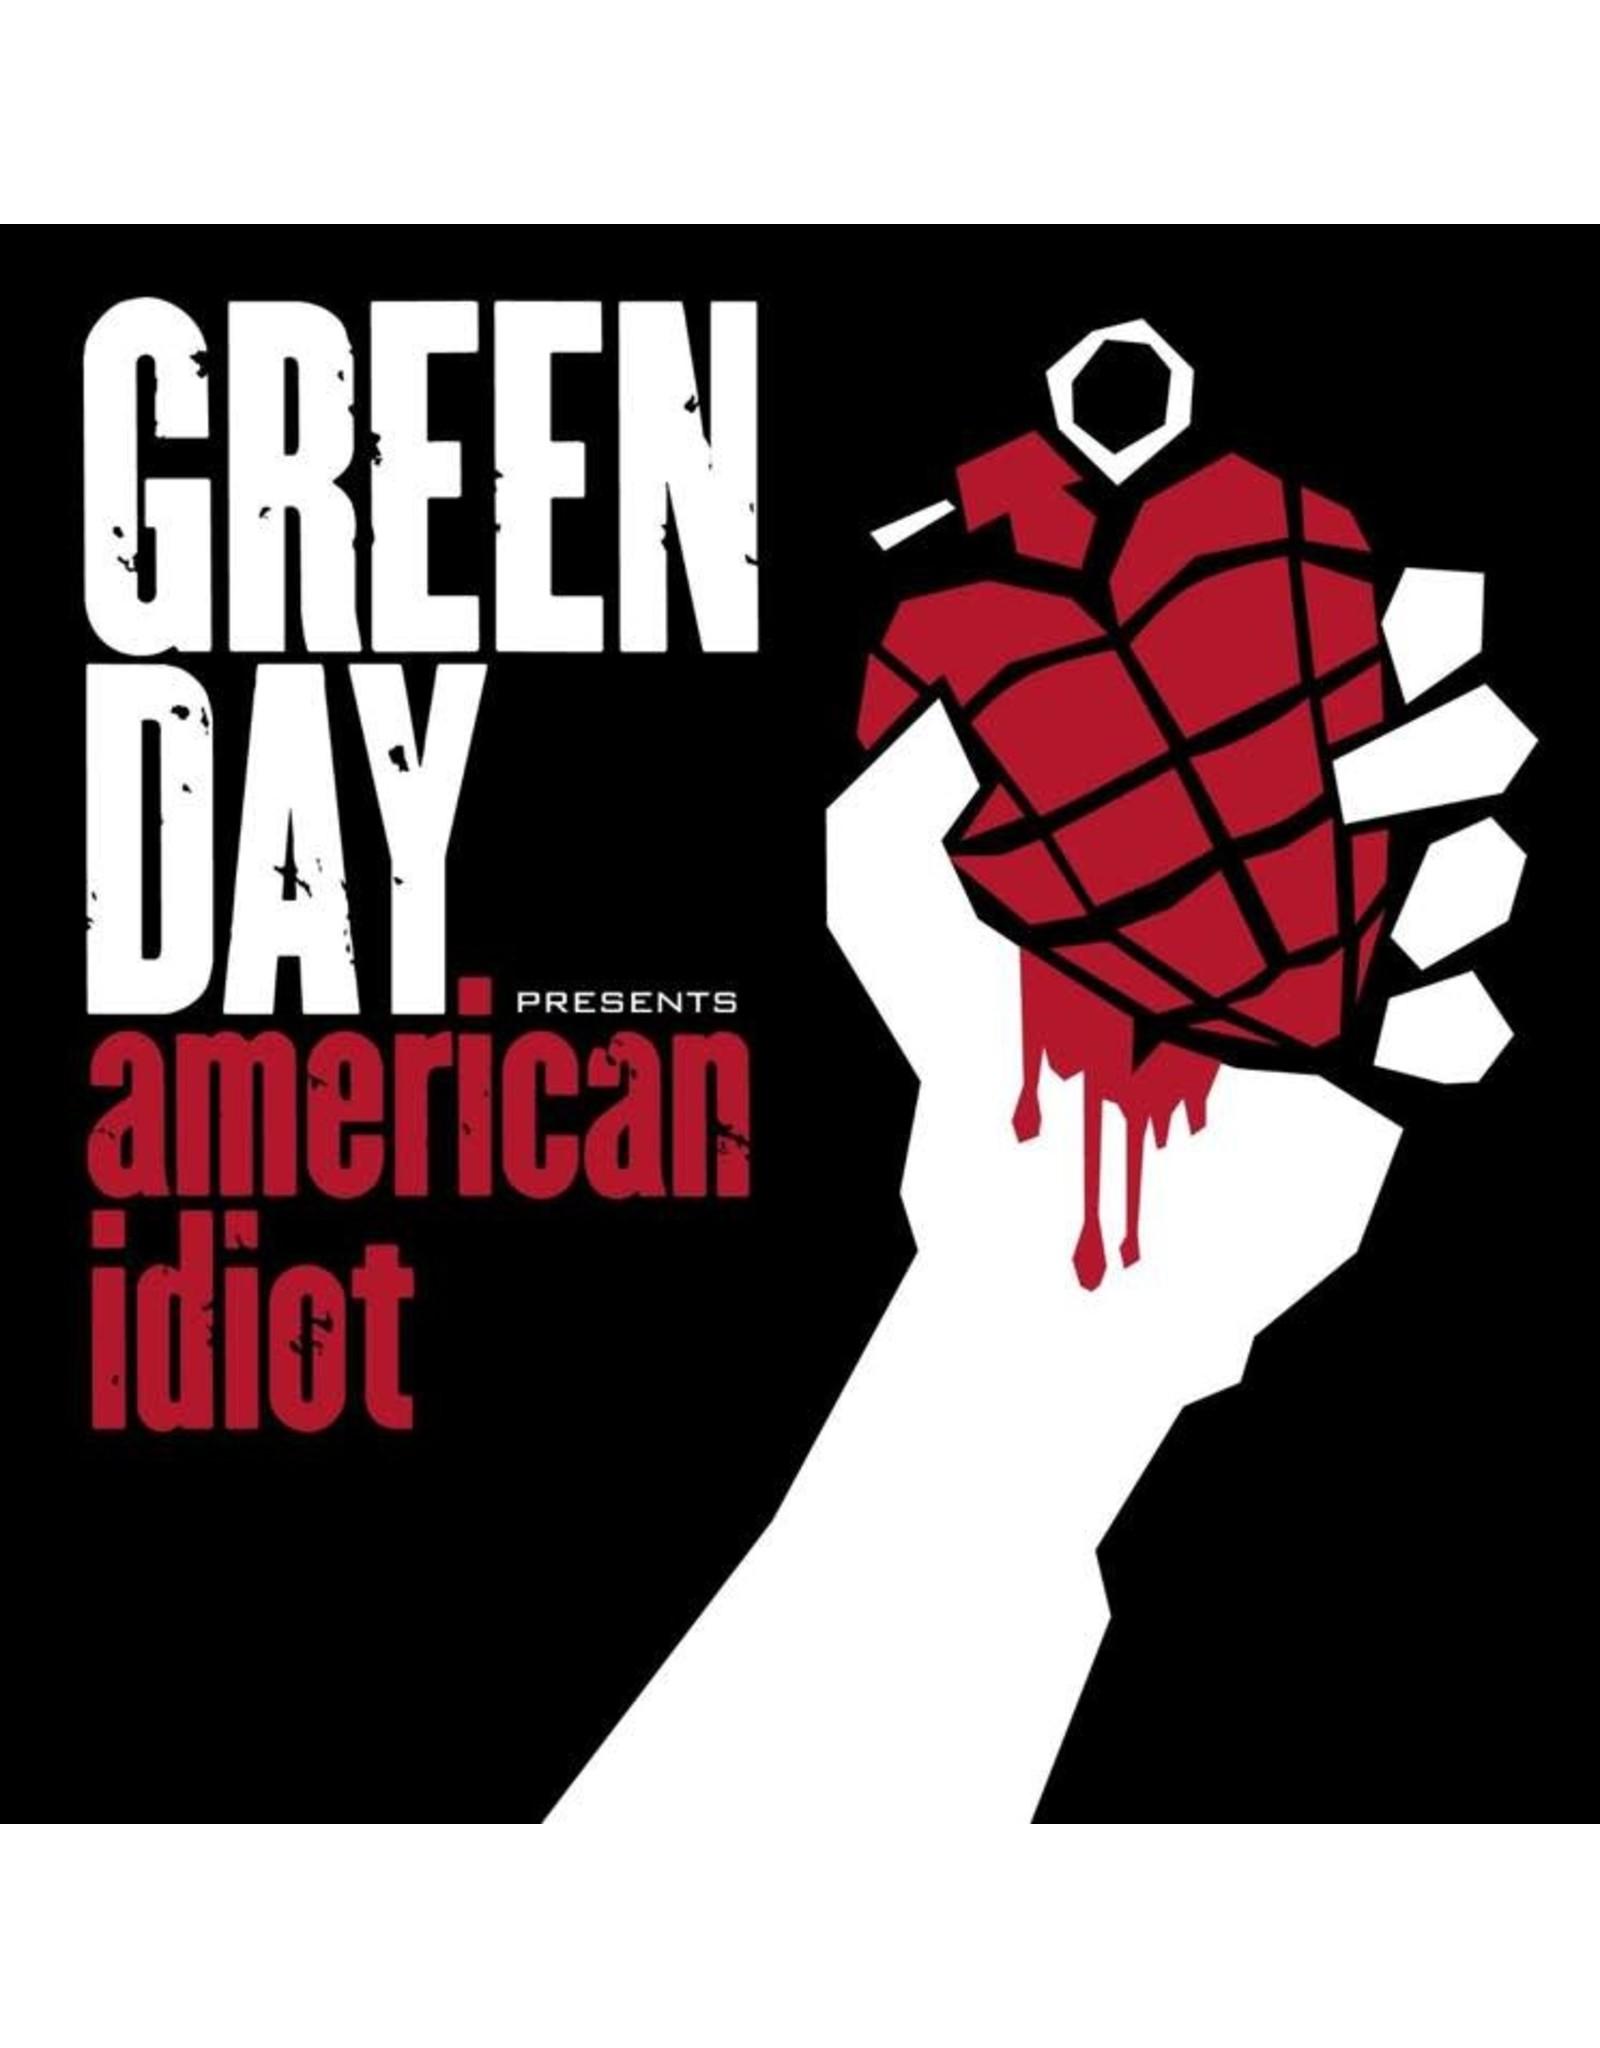 Green Day - American Idiot (Red / White Smoke Vinyl)